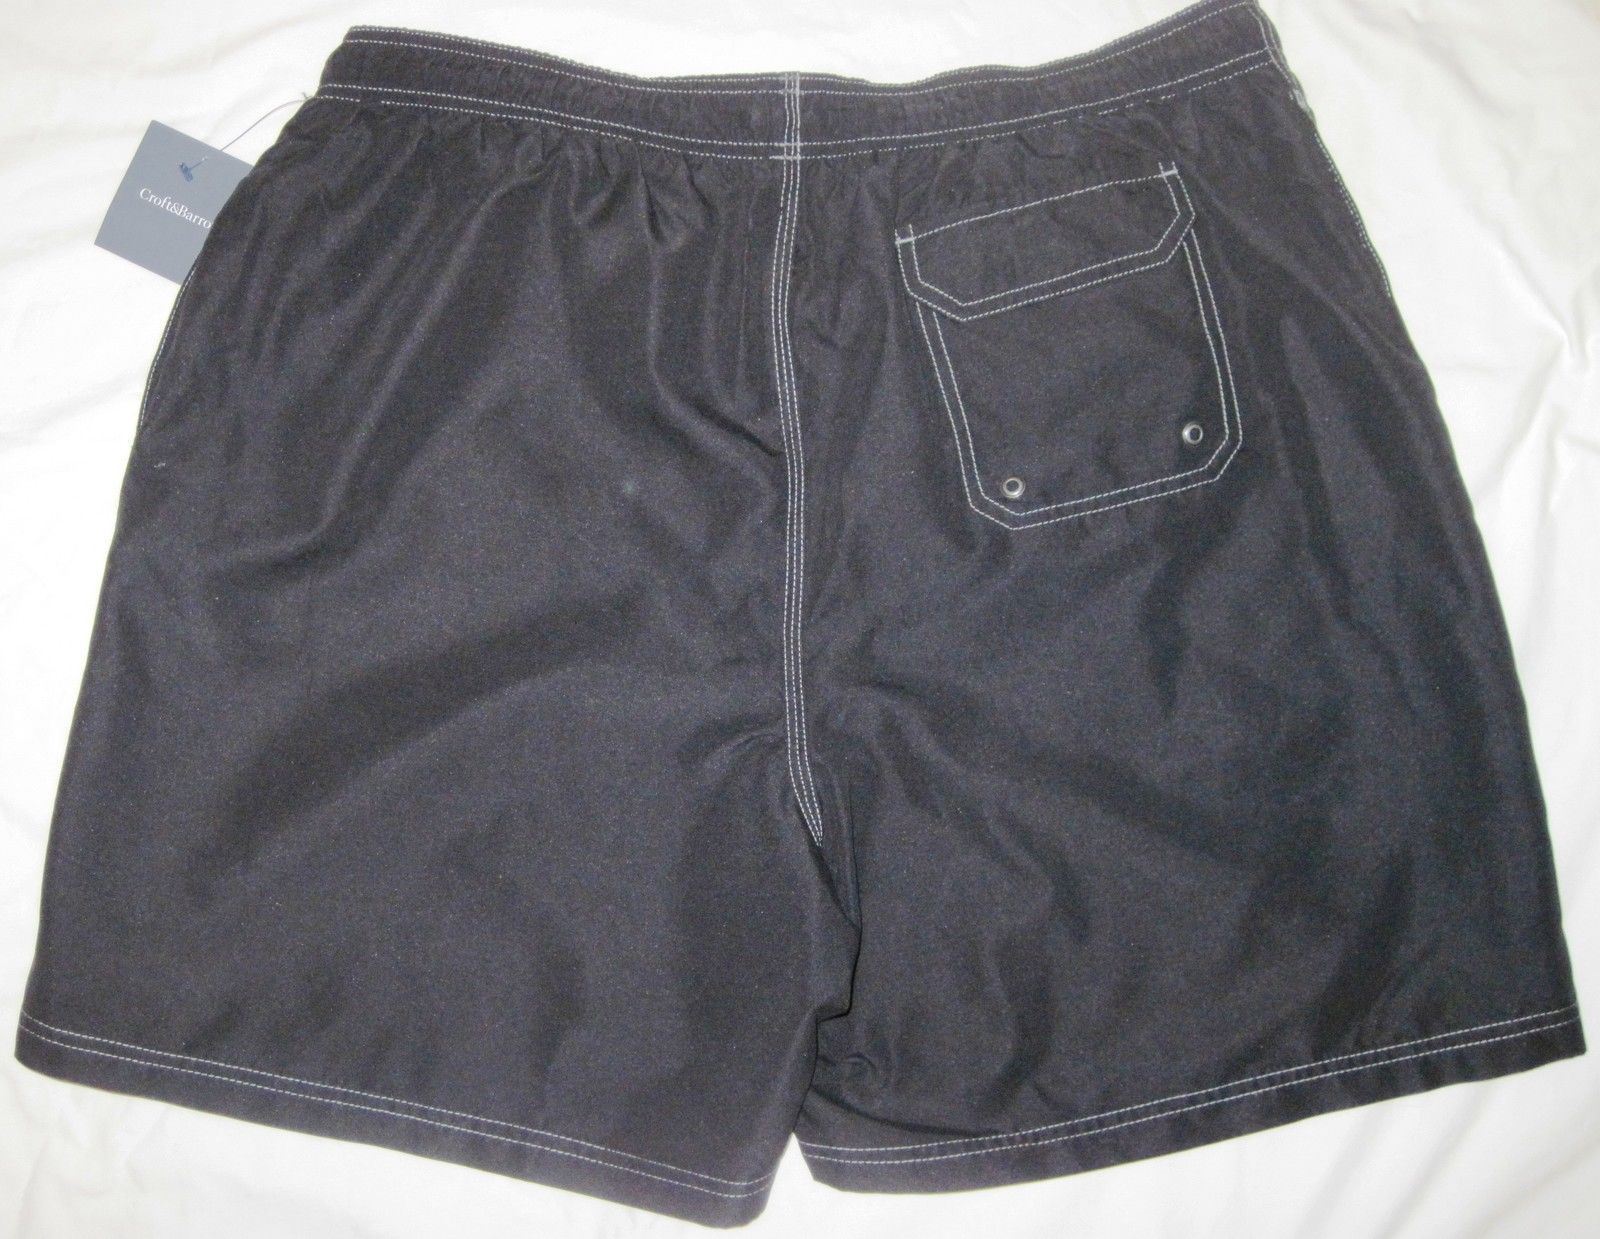 NWT CROFT & BARROW Swim Bathing Suit Trunks Mens XXL black or gray solid Poly image 8